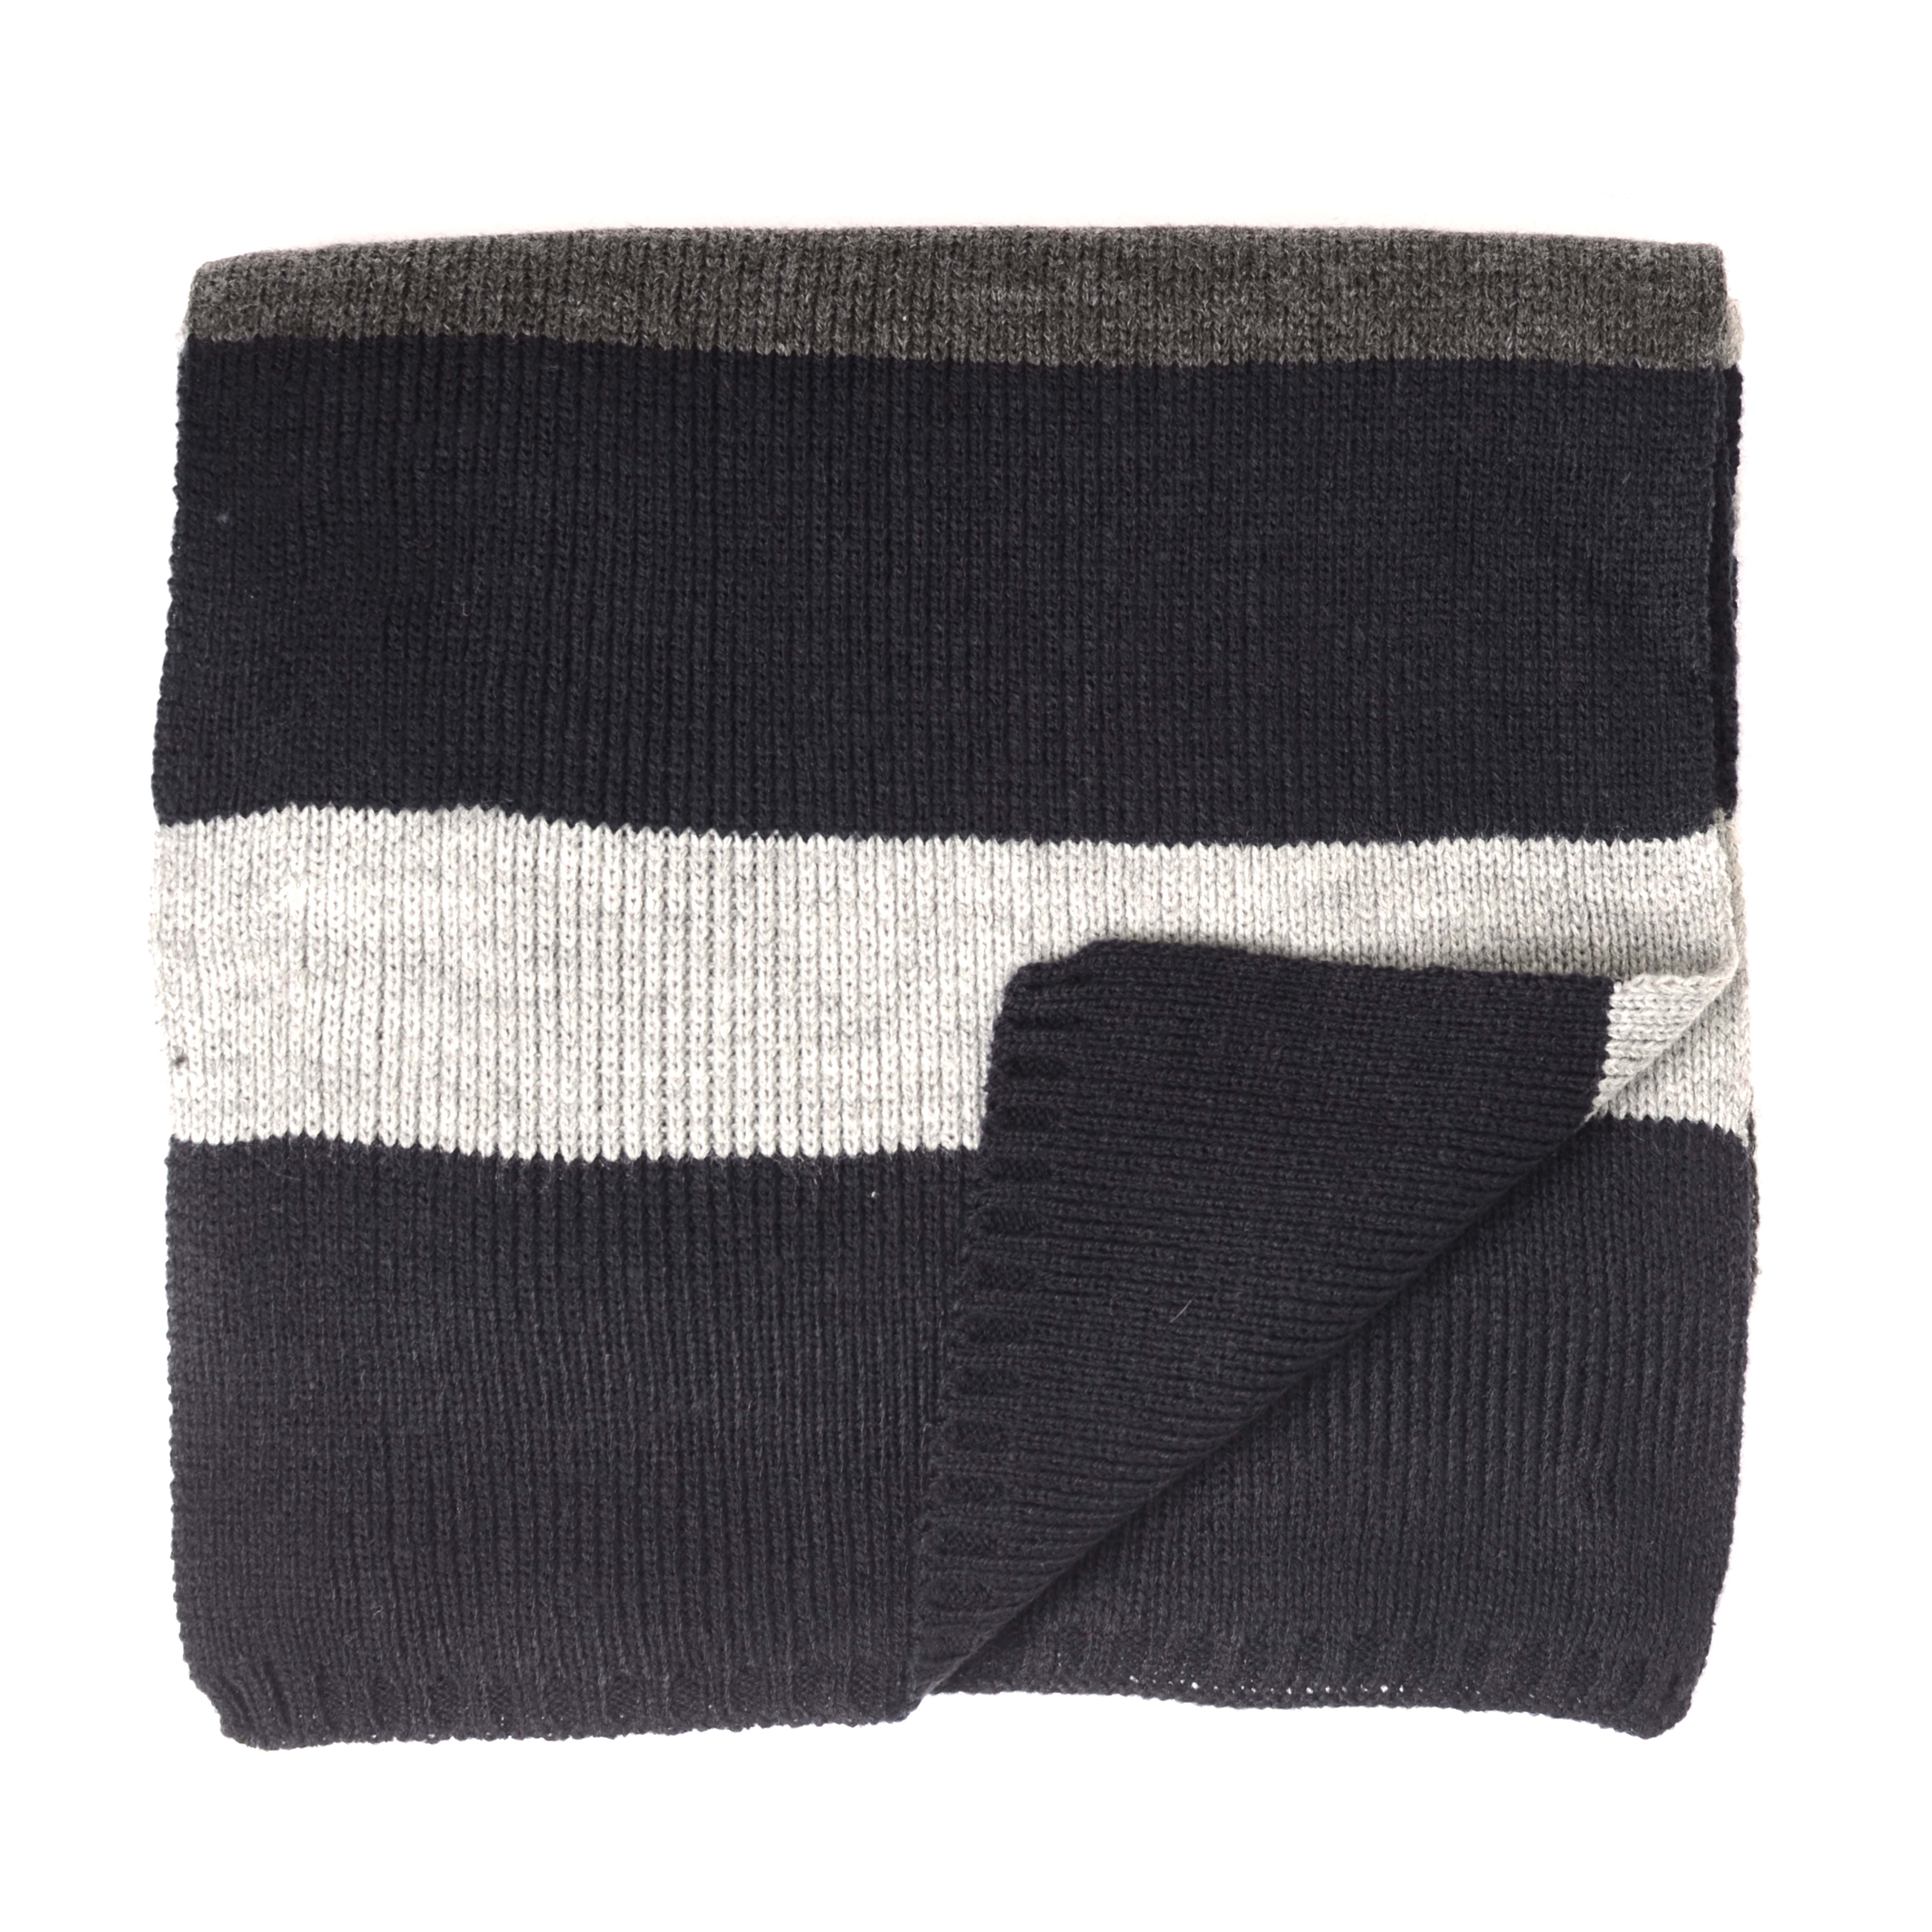 Jordi   Scarf knitted with blocks grey